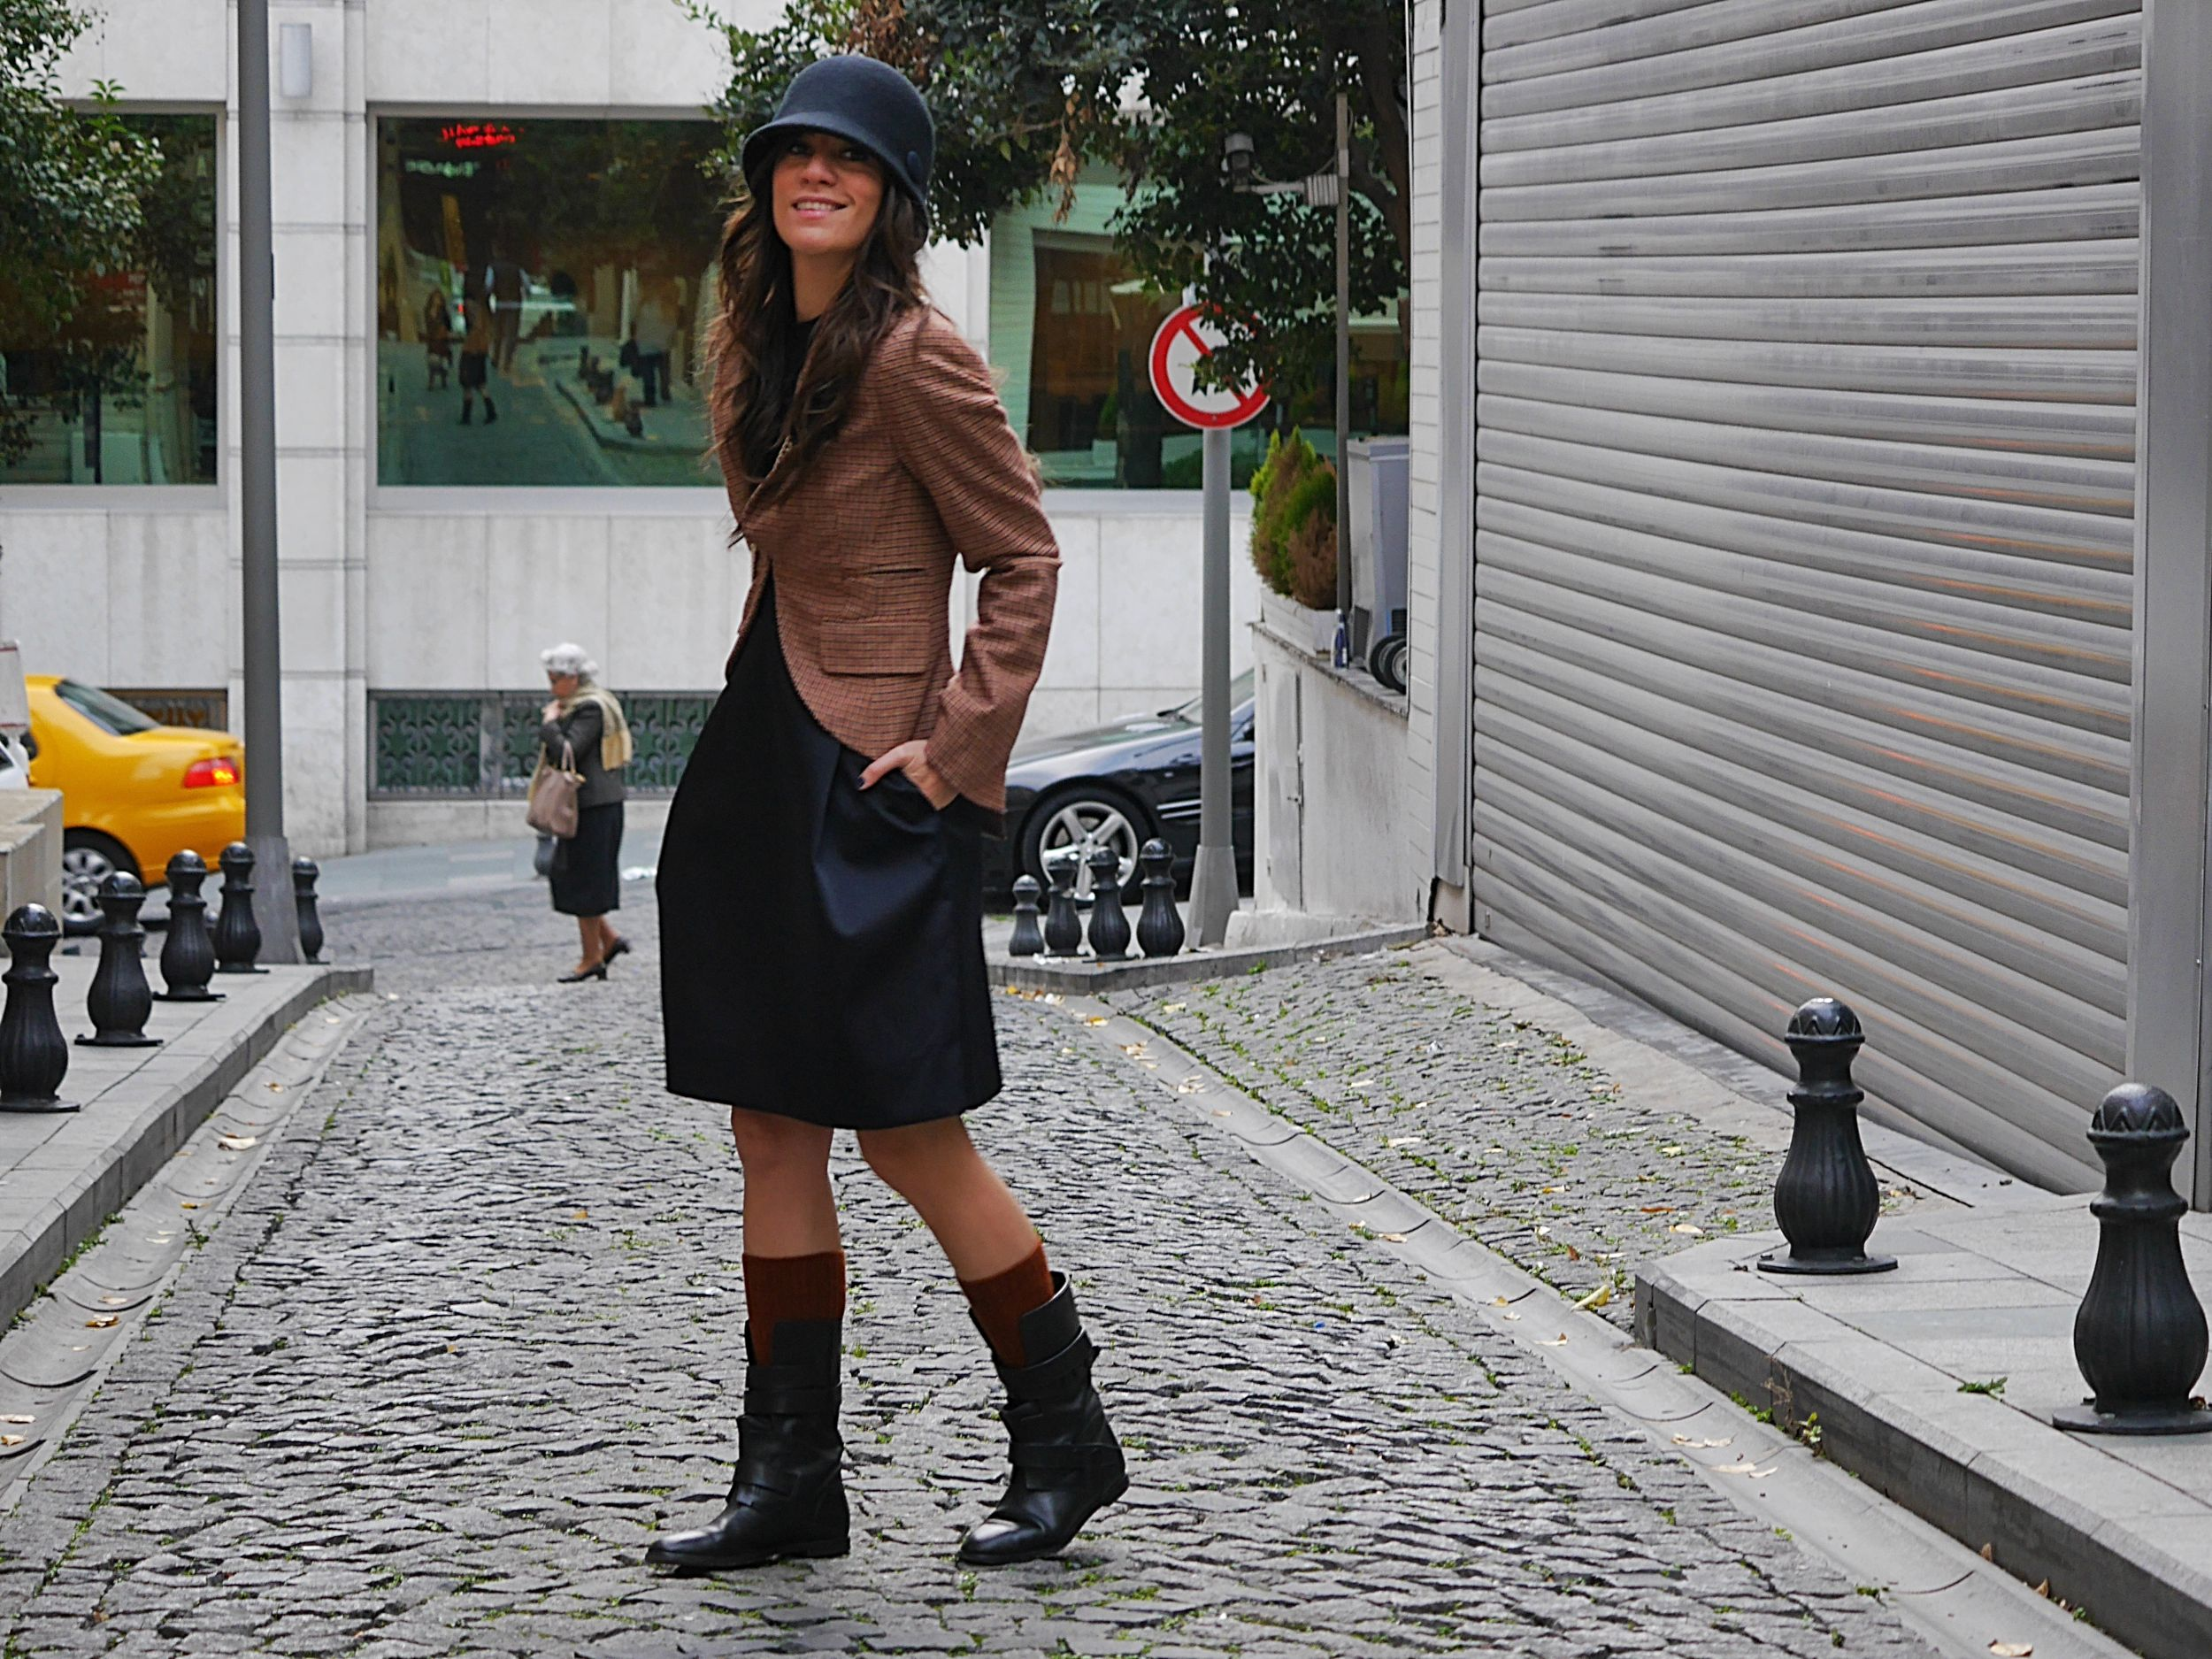 cos, uterque, alexander wang, mademoiselle tara, h&m, wear layers, l.a.m.b., street style, trench, off ne giysem